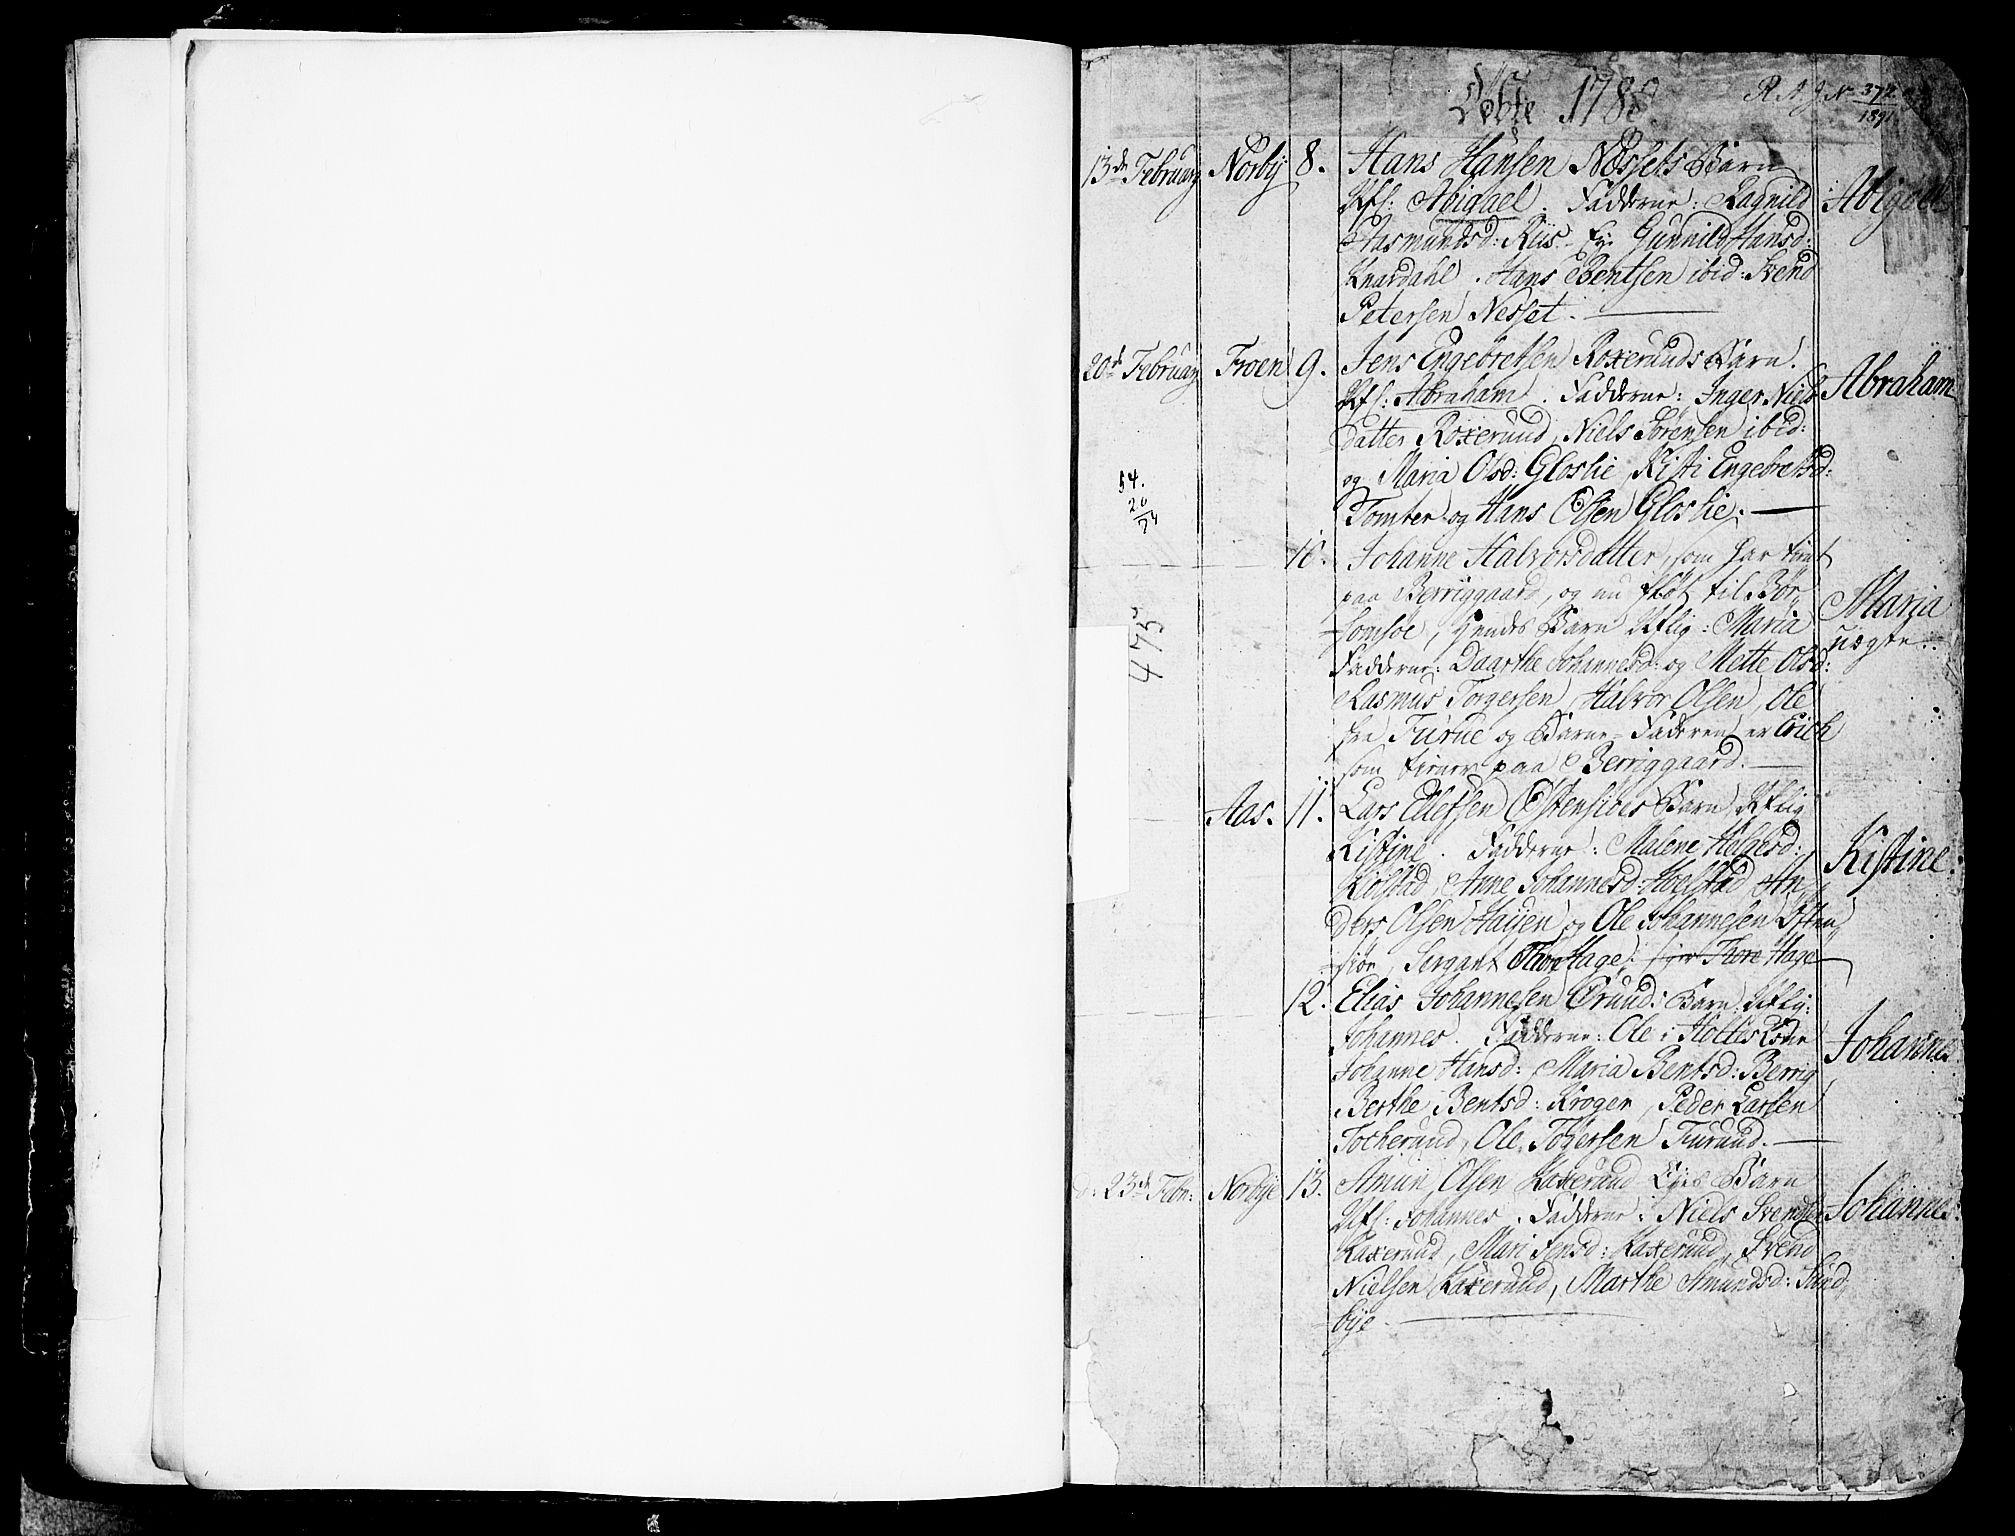 SAO, Ås prestekontor Kirkebøker, F/Fa/L0002: Parish register (official) no. I 2, 1778-1813, p. 23